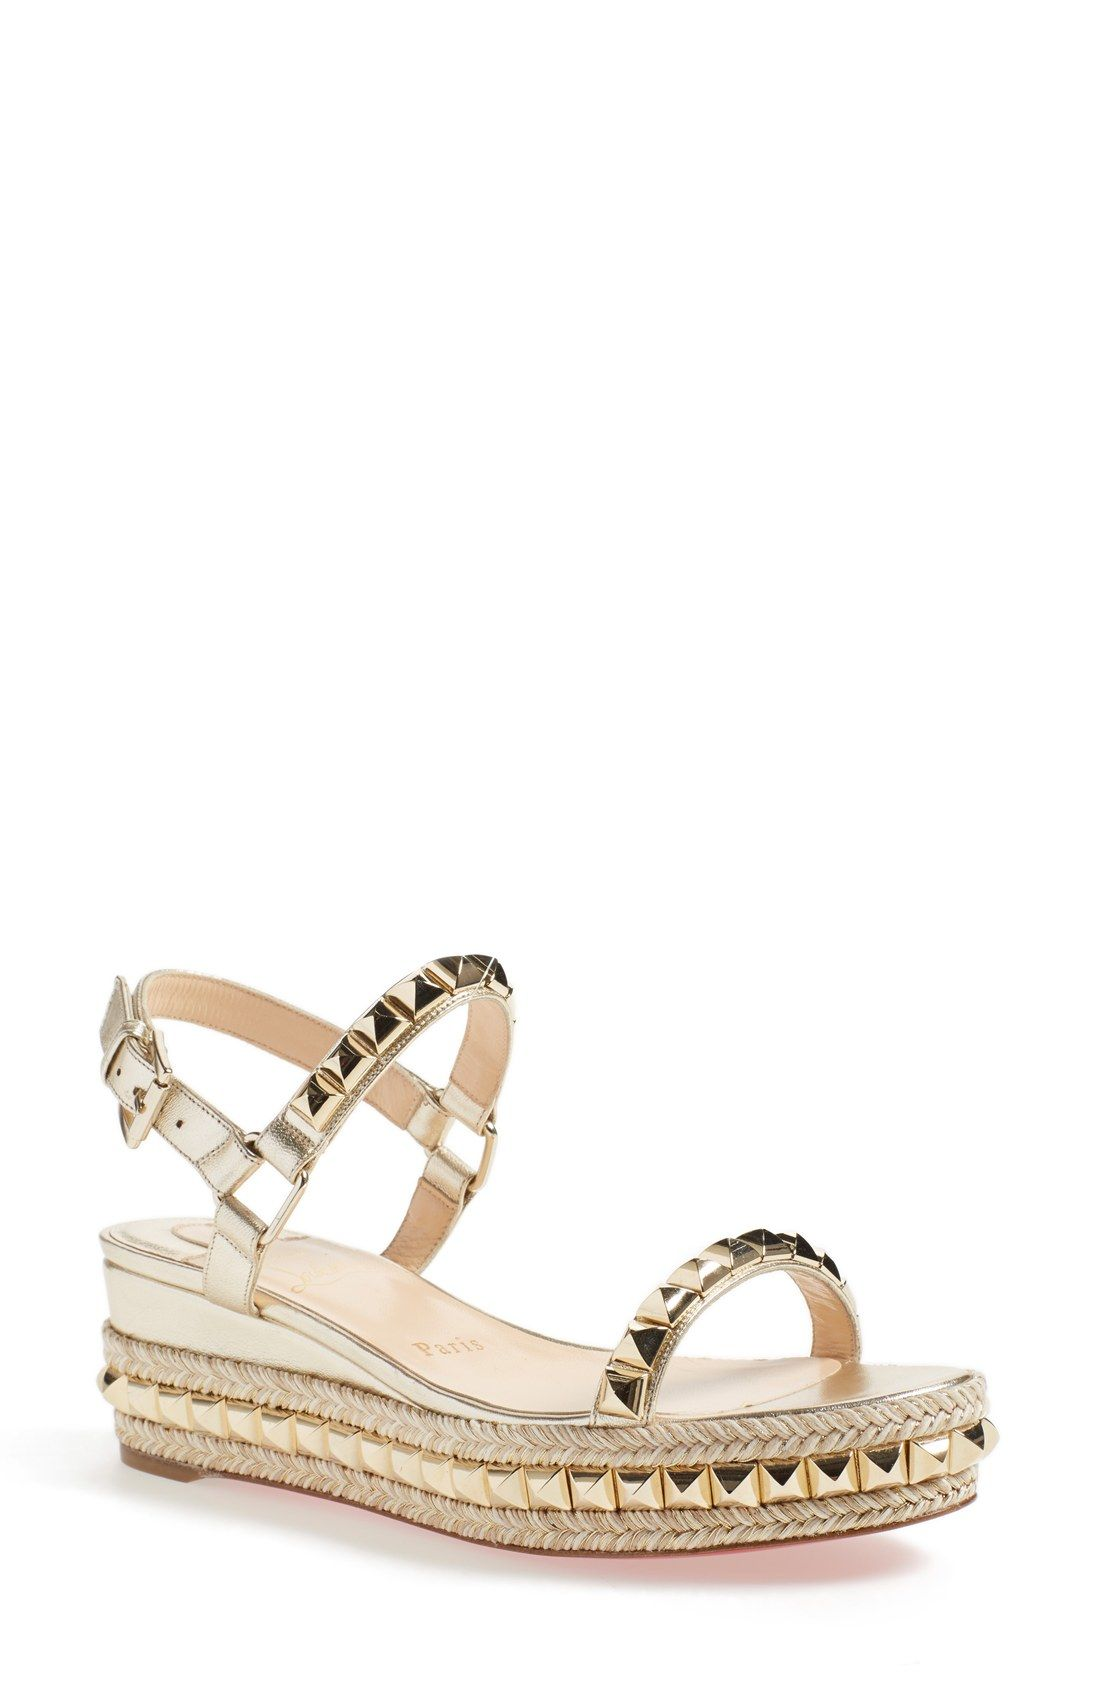 a43932c48a4 Christian Louboutin 'Cataclou' Espadrille Platform Sandal | Couture ...